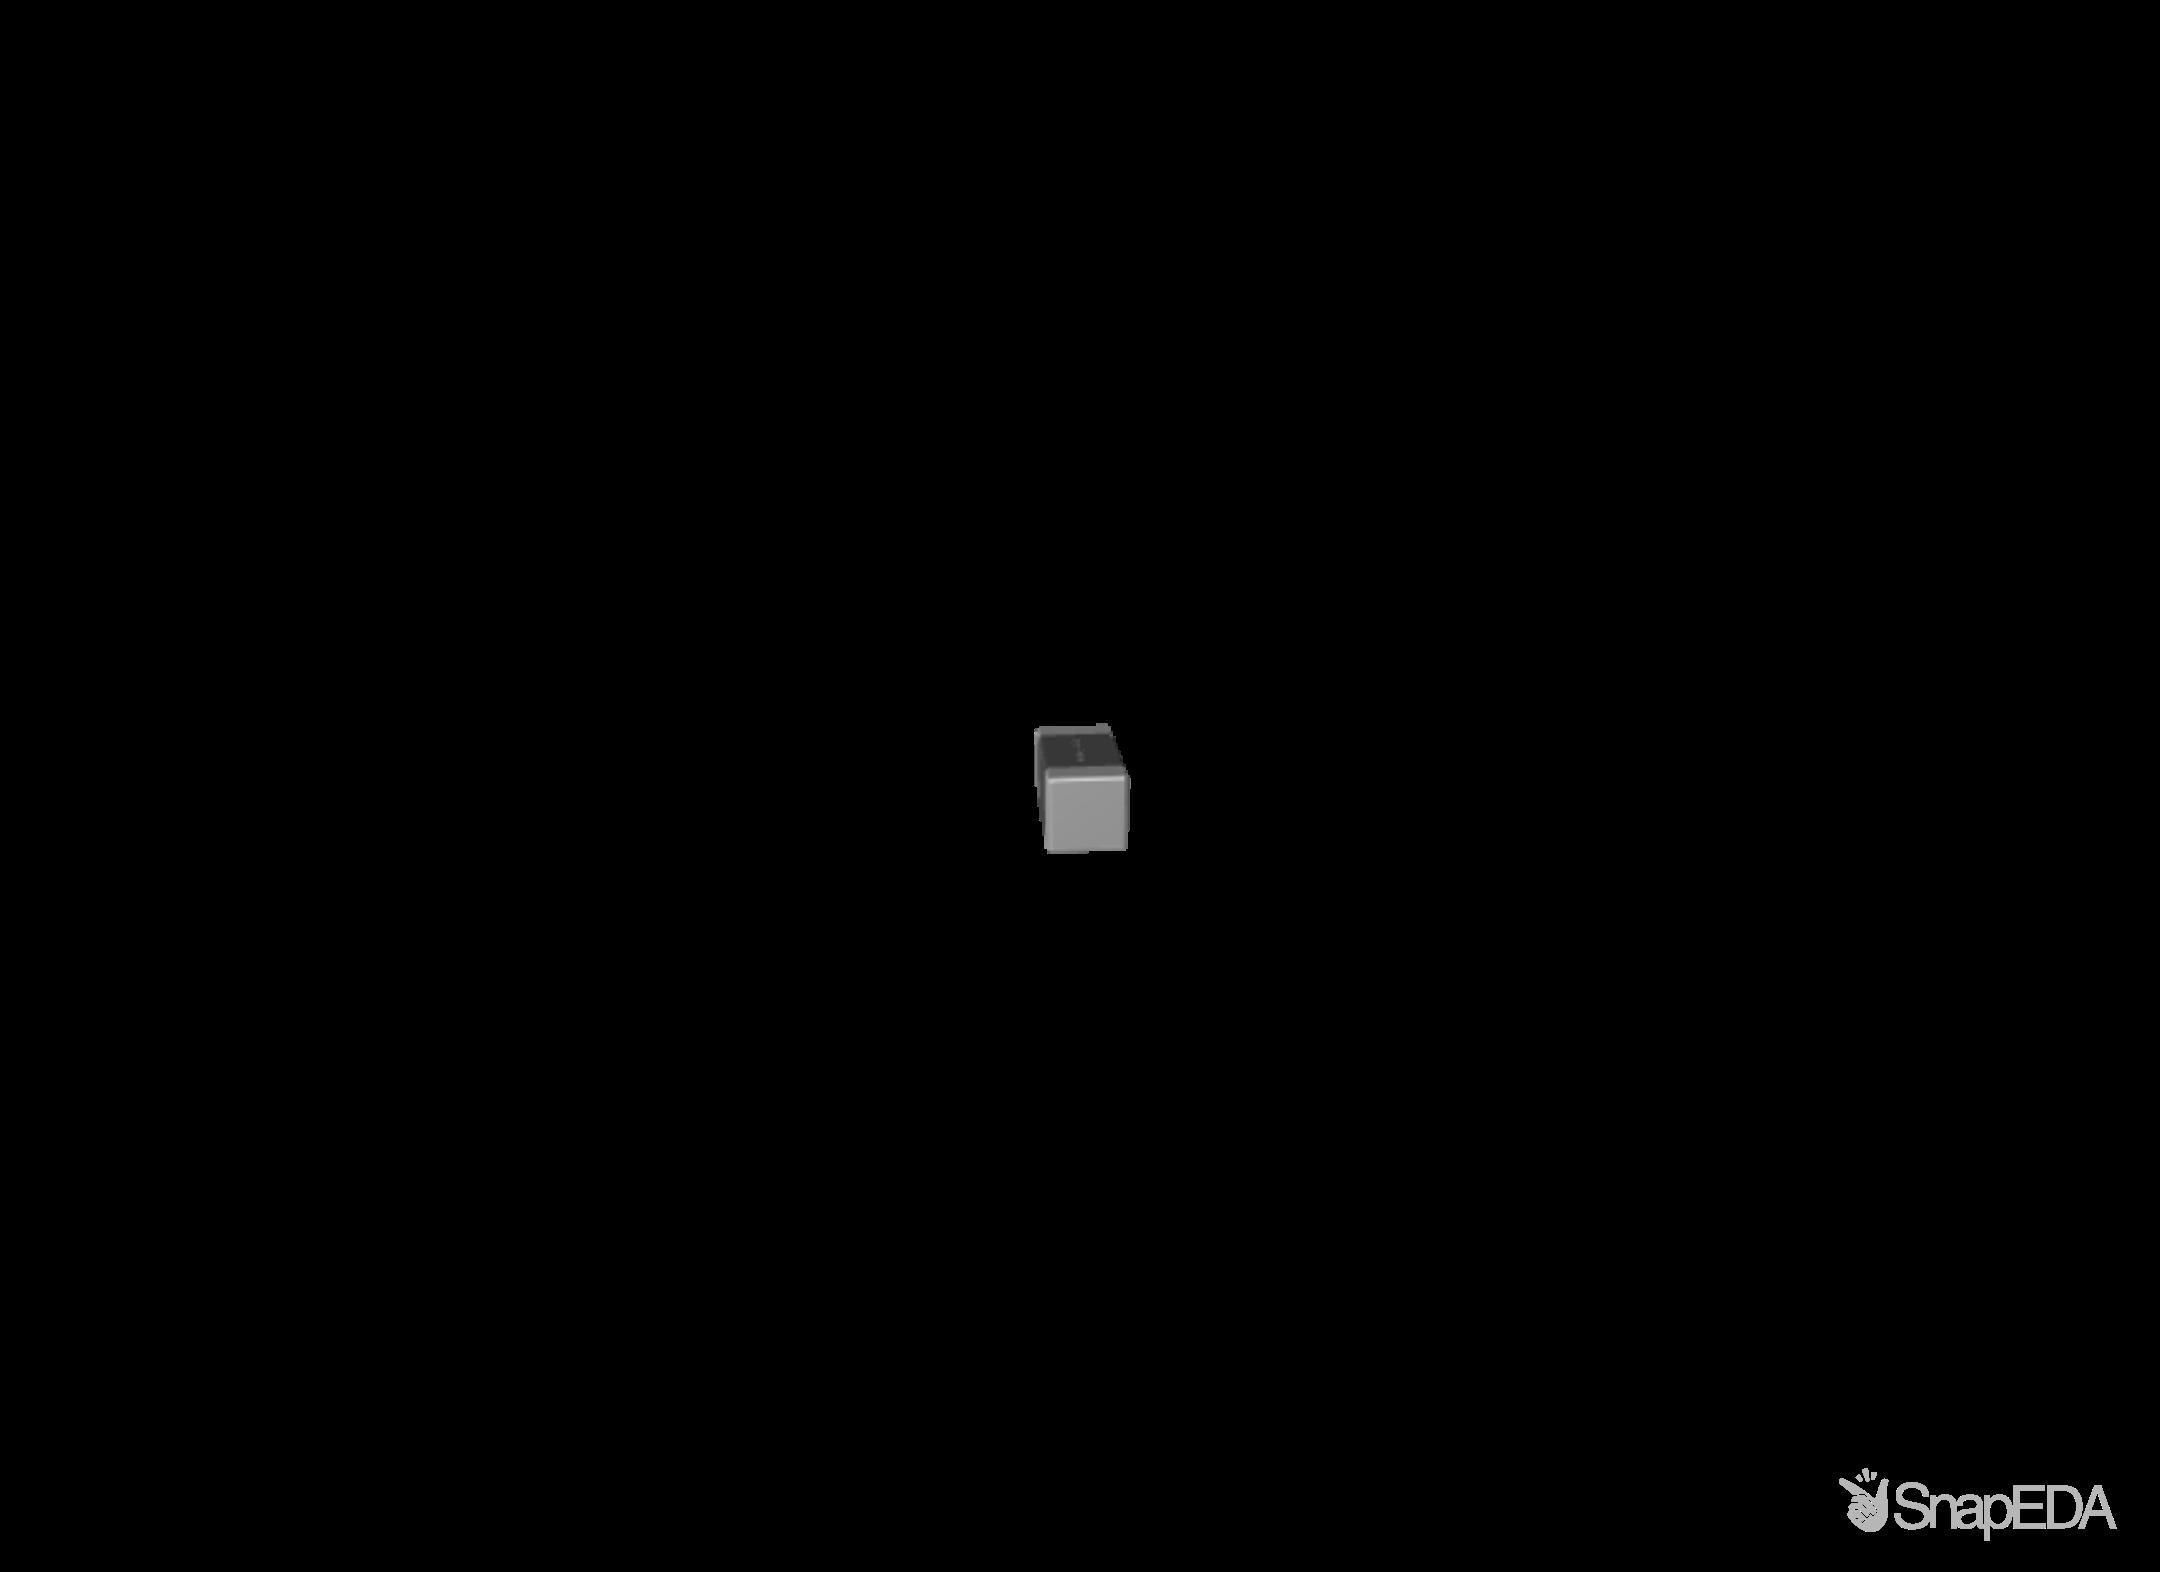 AIMC-0603-1N8S-T 3D Model